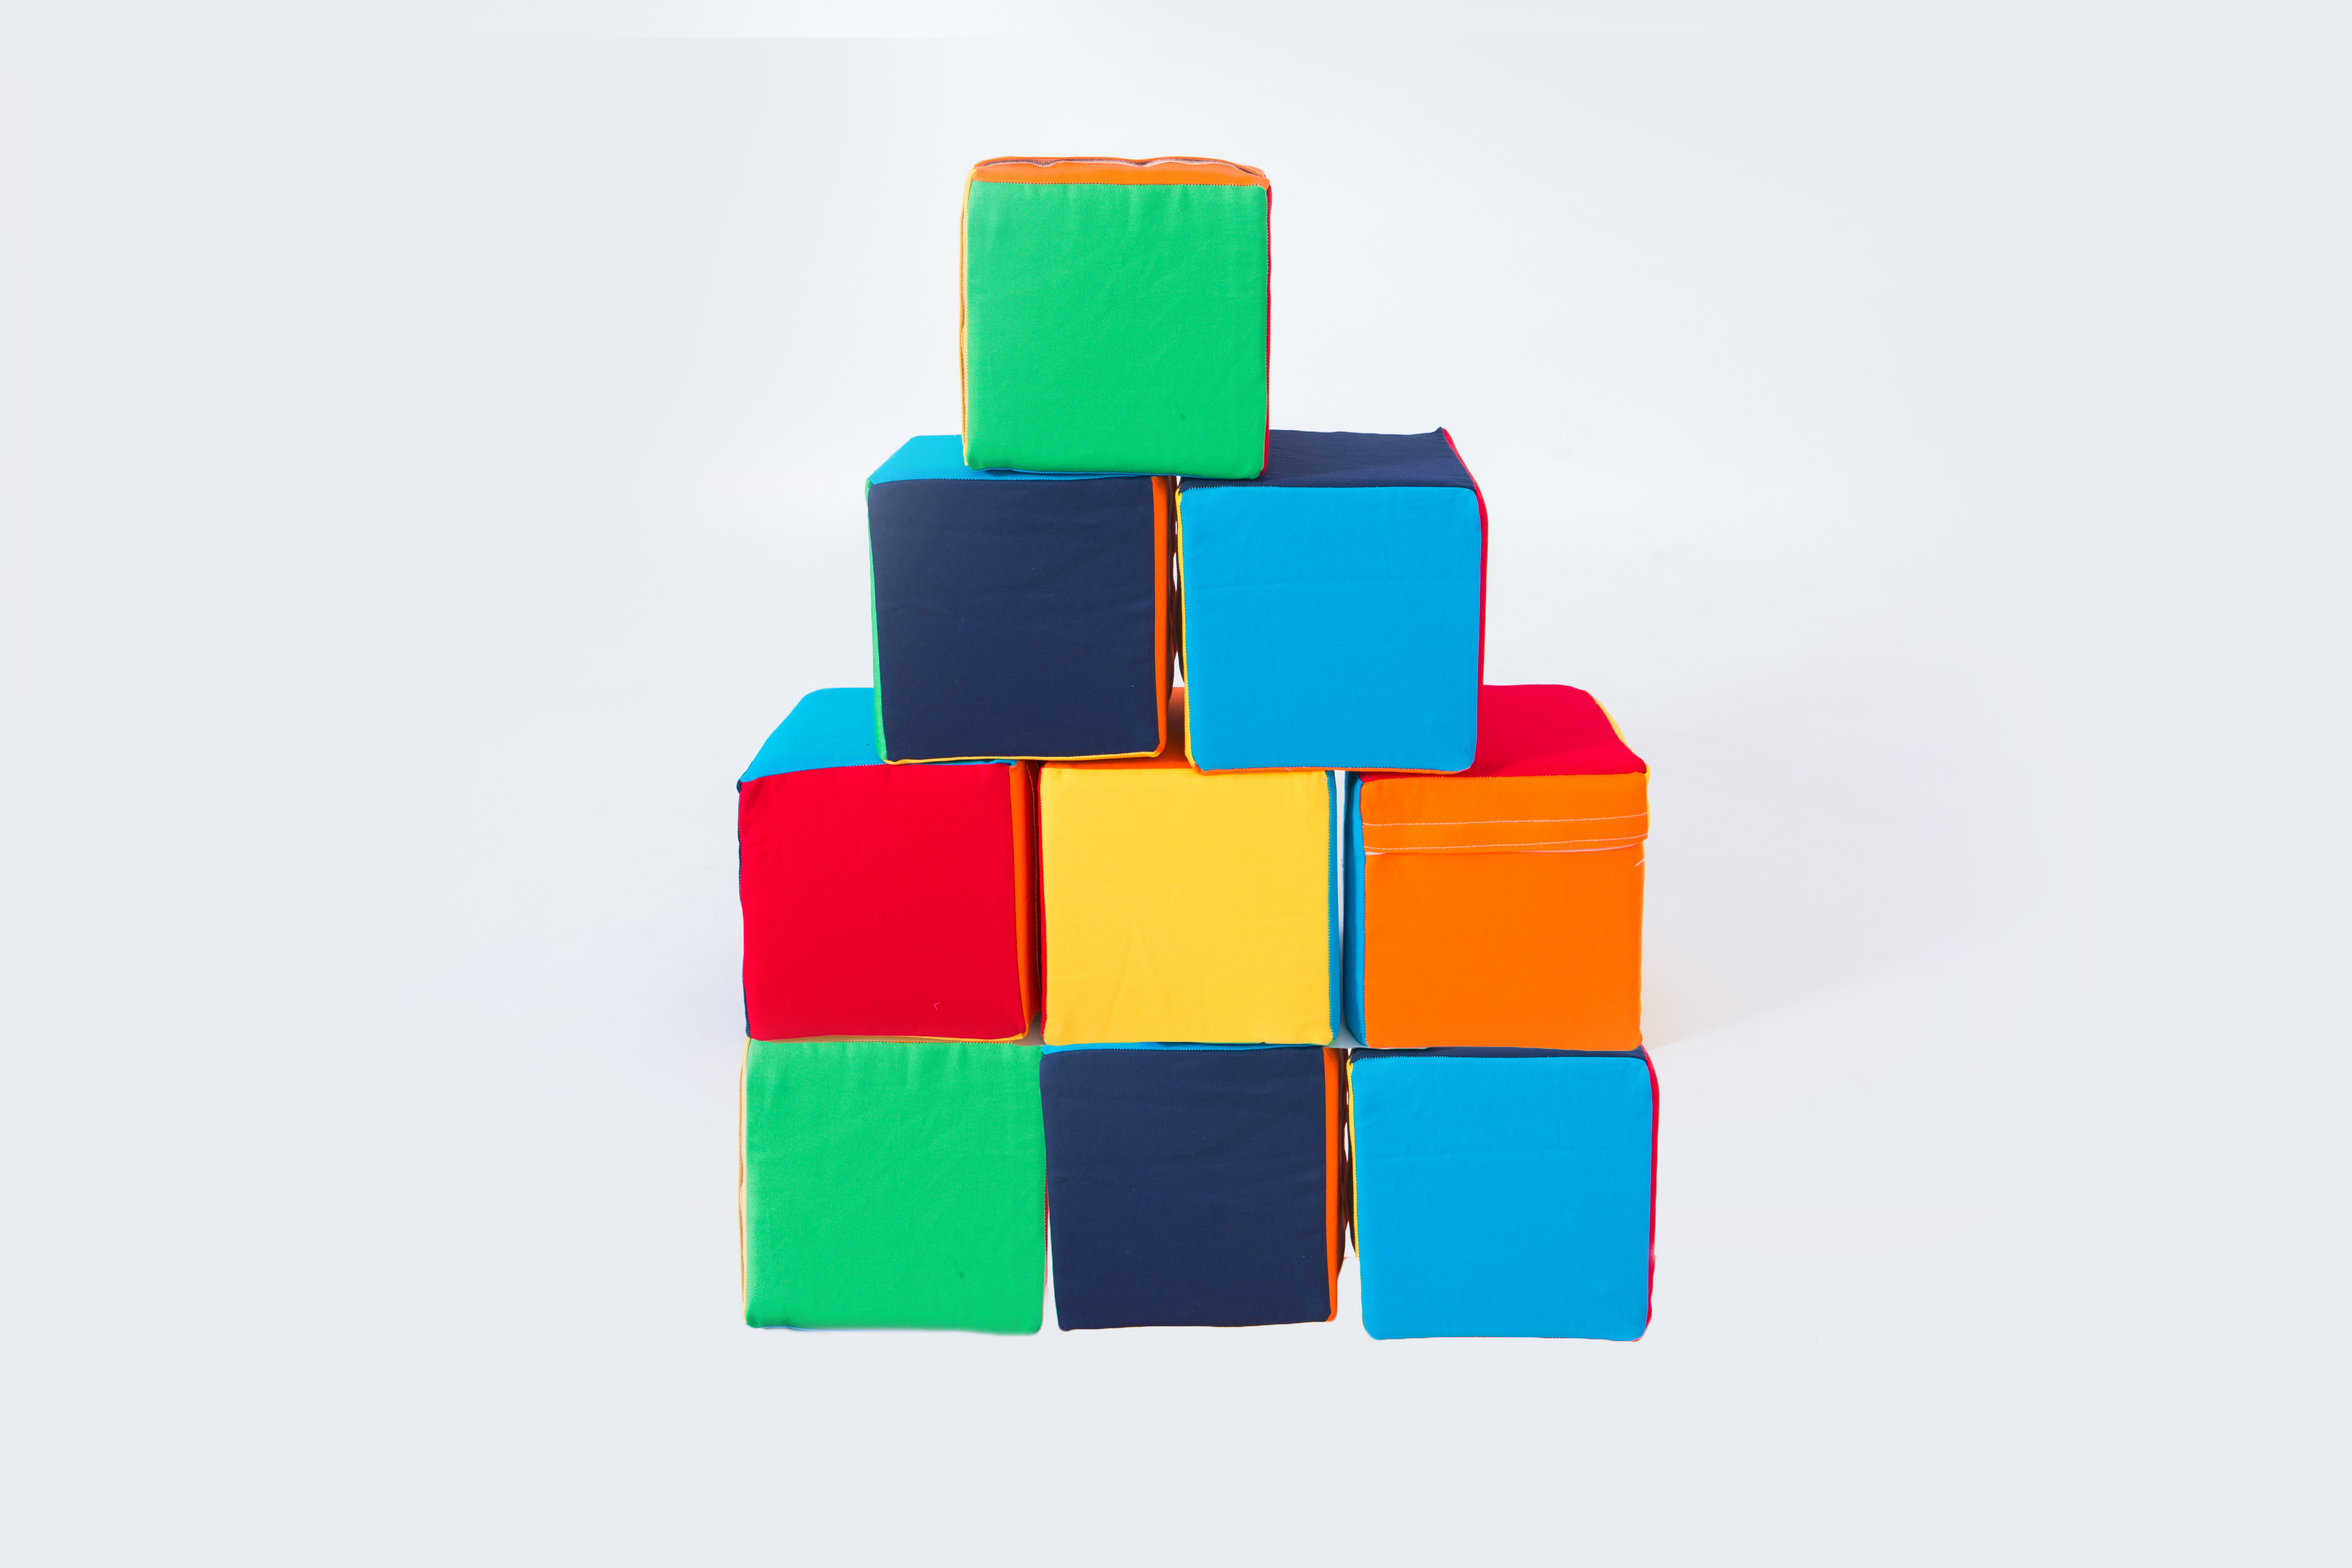 Molitanová stavebnice 9 dílů barevné kostky Velikost L - 20 cm